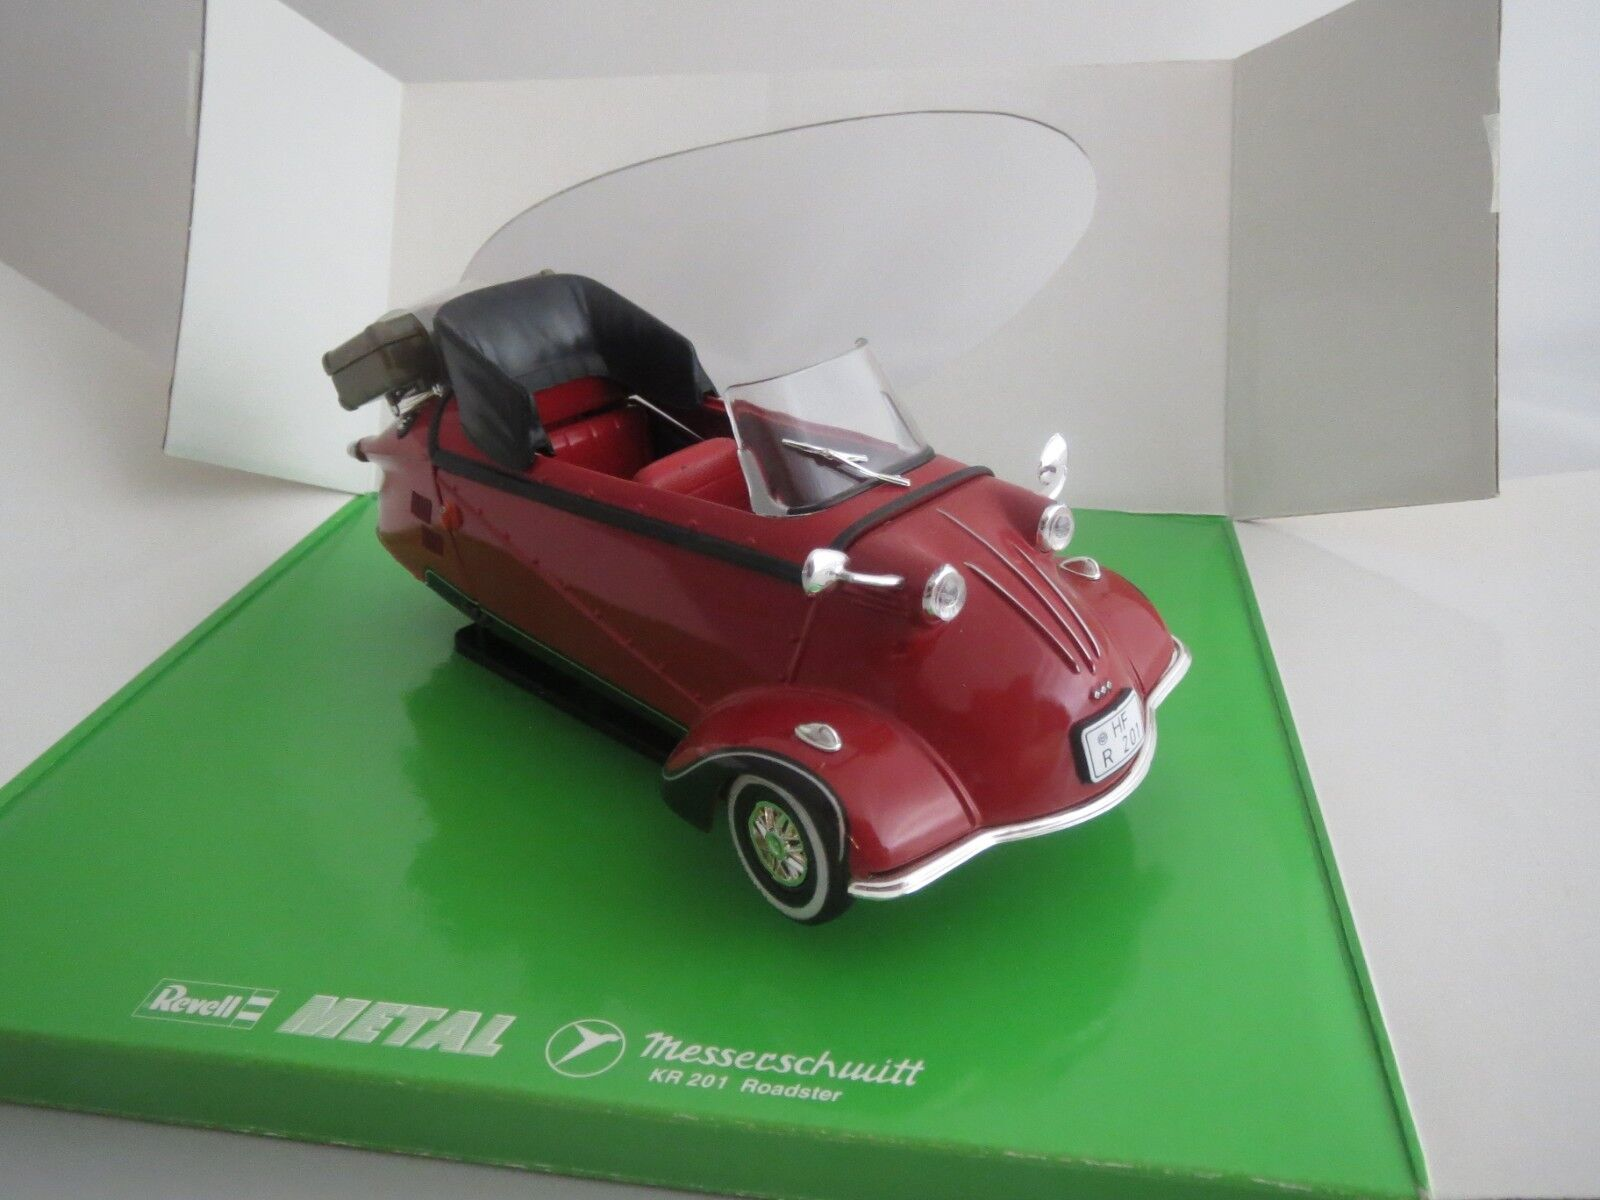 Revell 08966 Messerschmitt ap 201 roadster (rojo negro) 1 18 embalaje original (3)